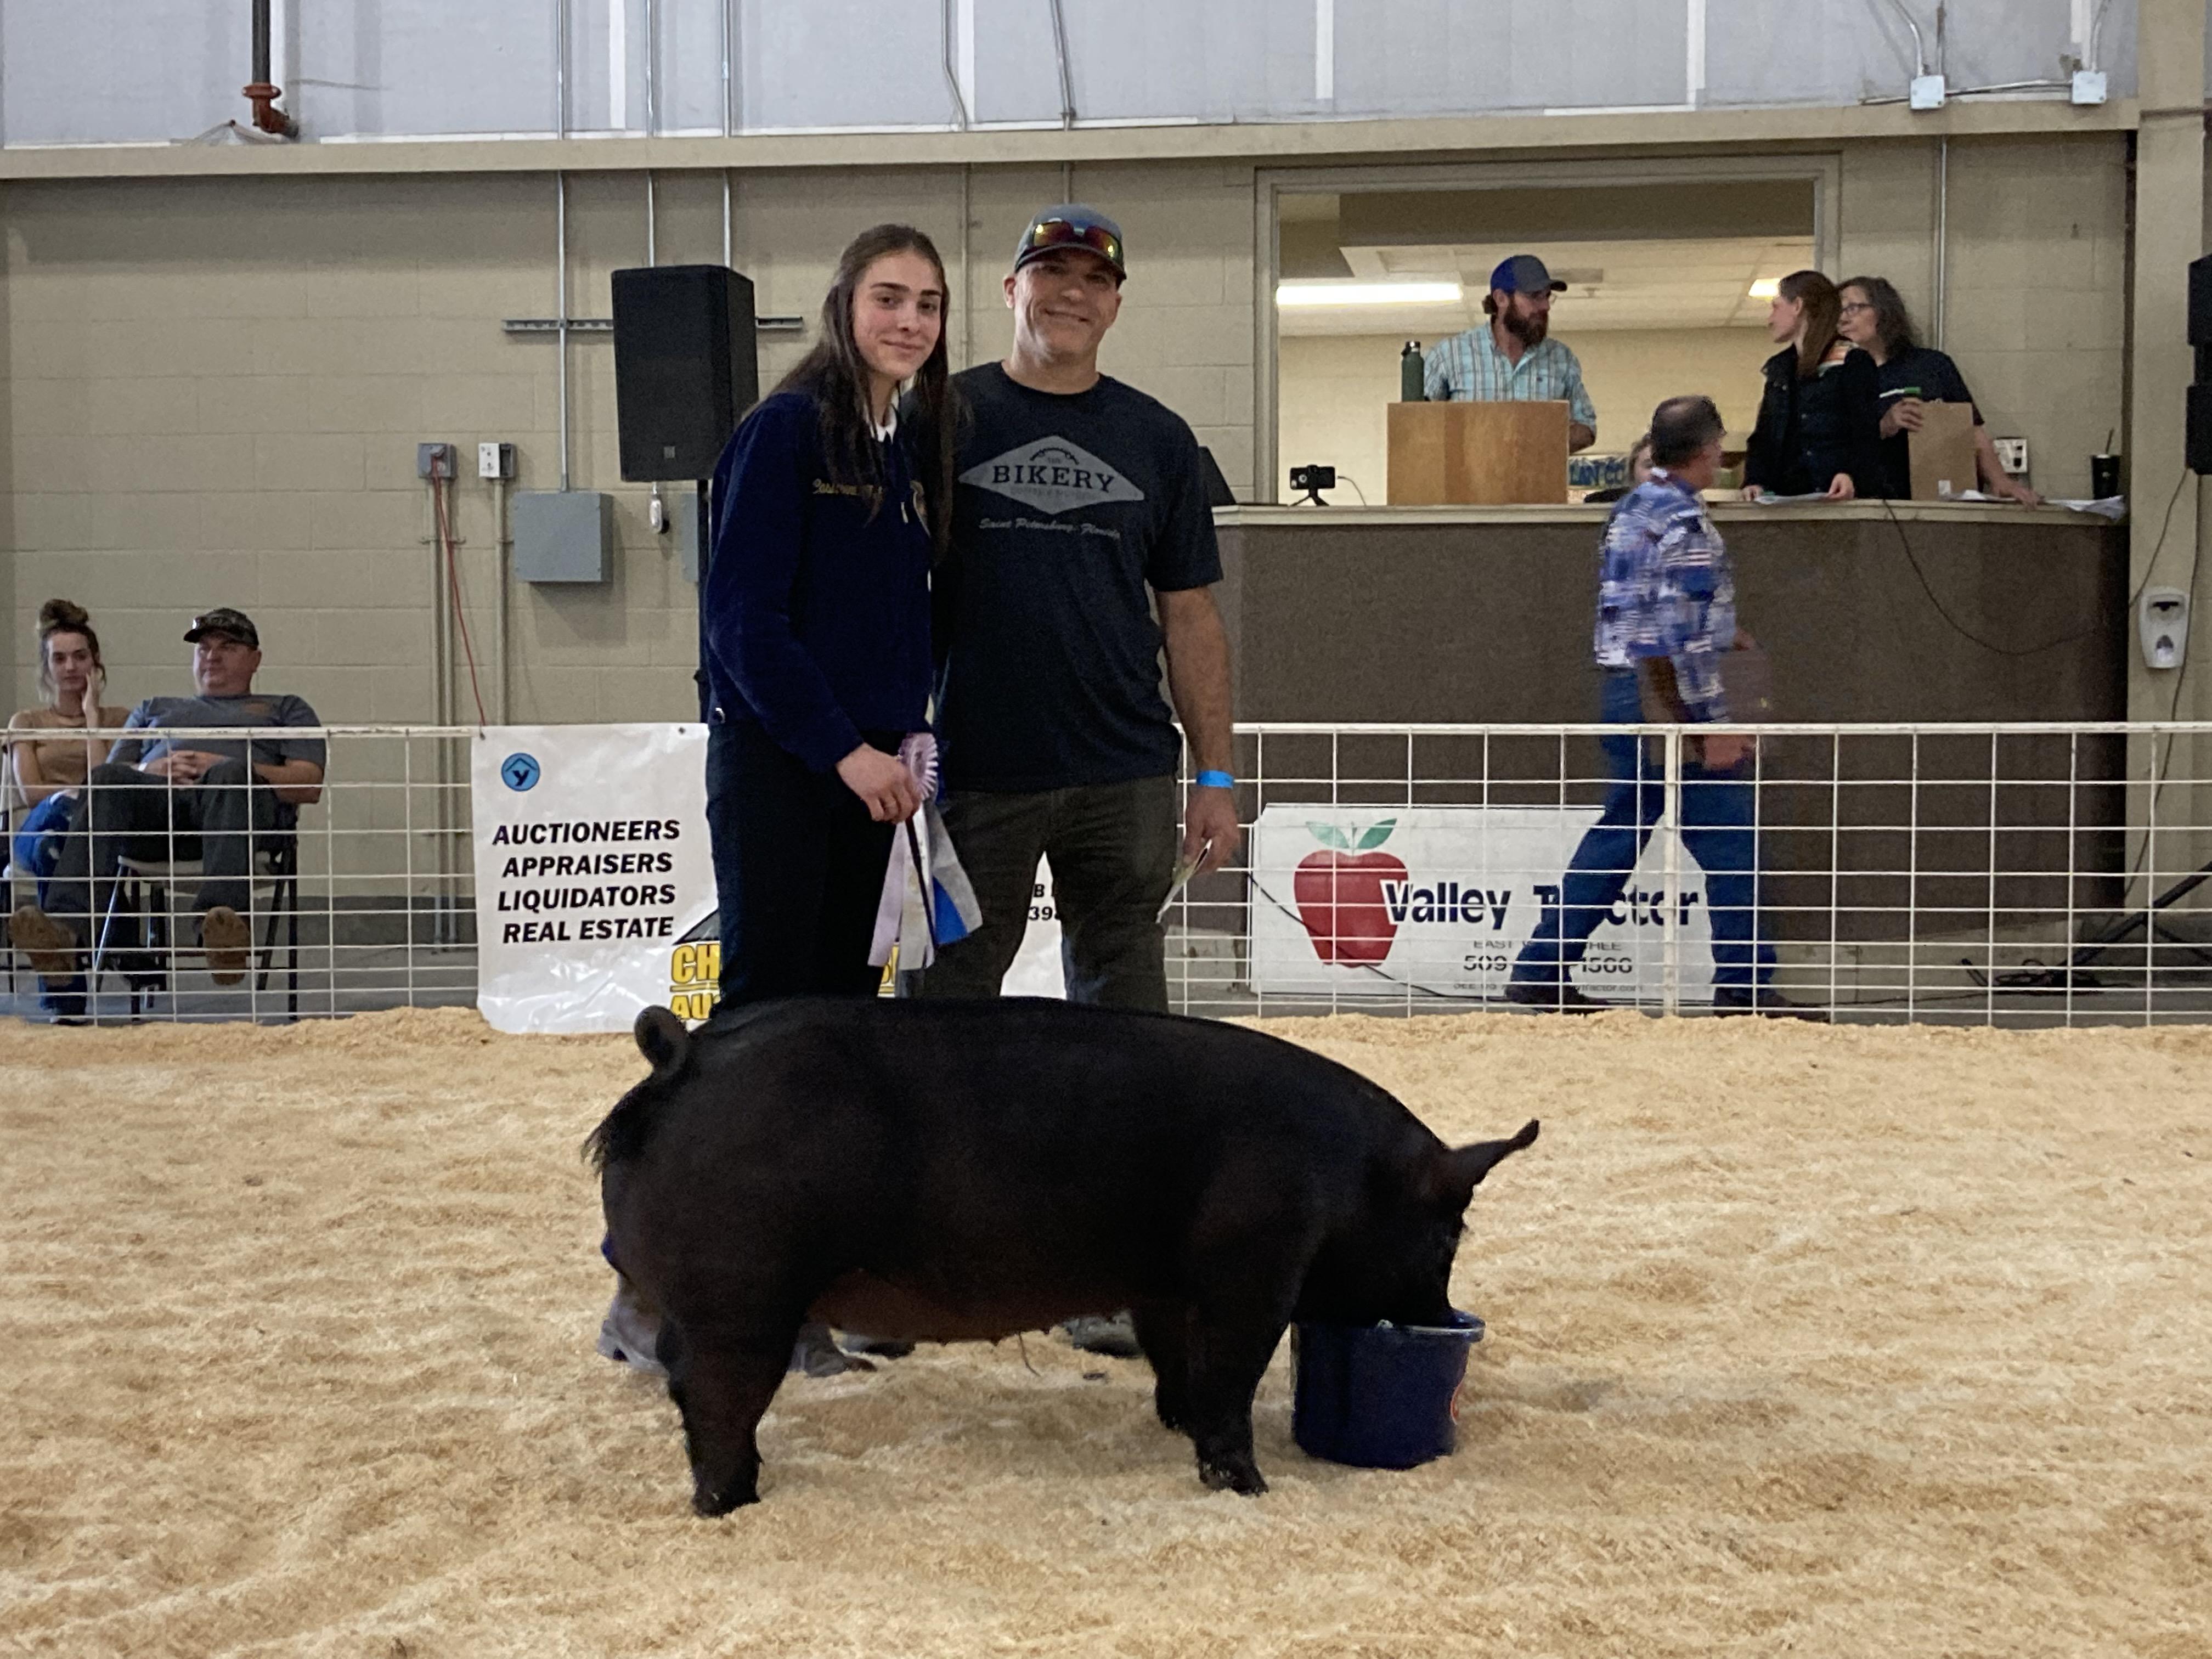 Jordan Holladay and the Hog